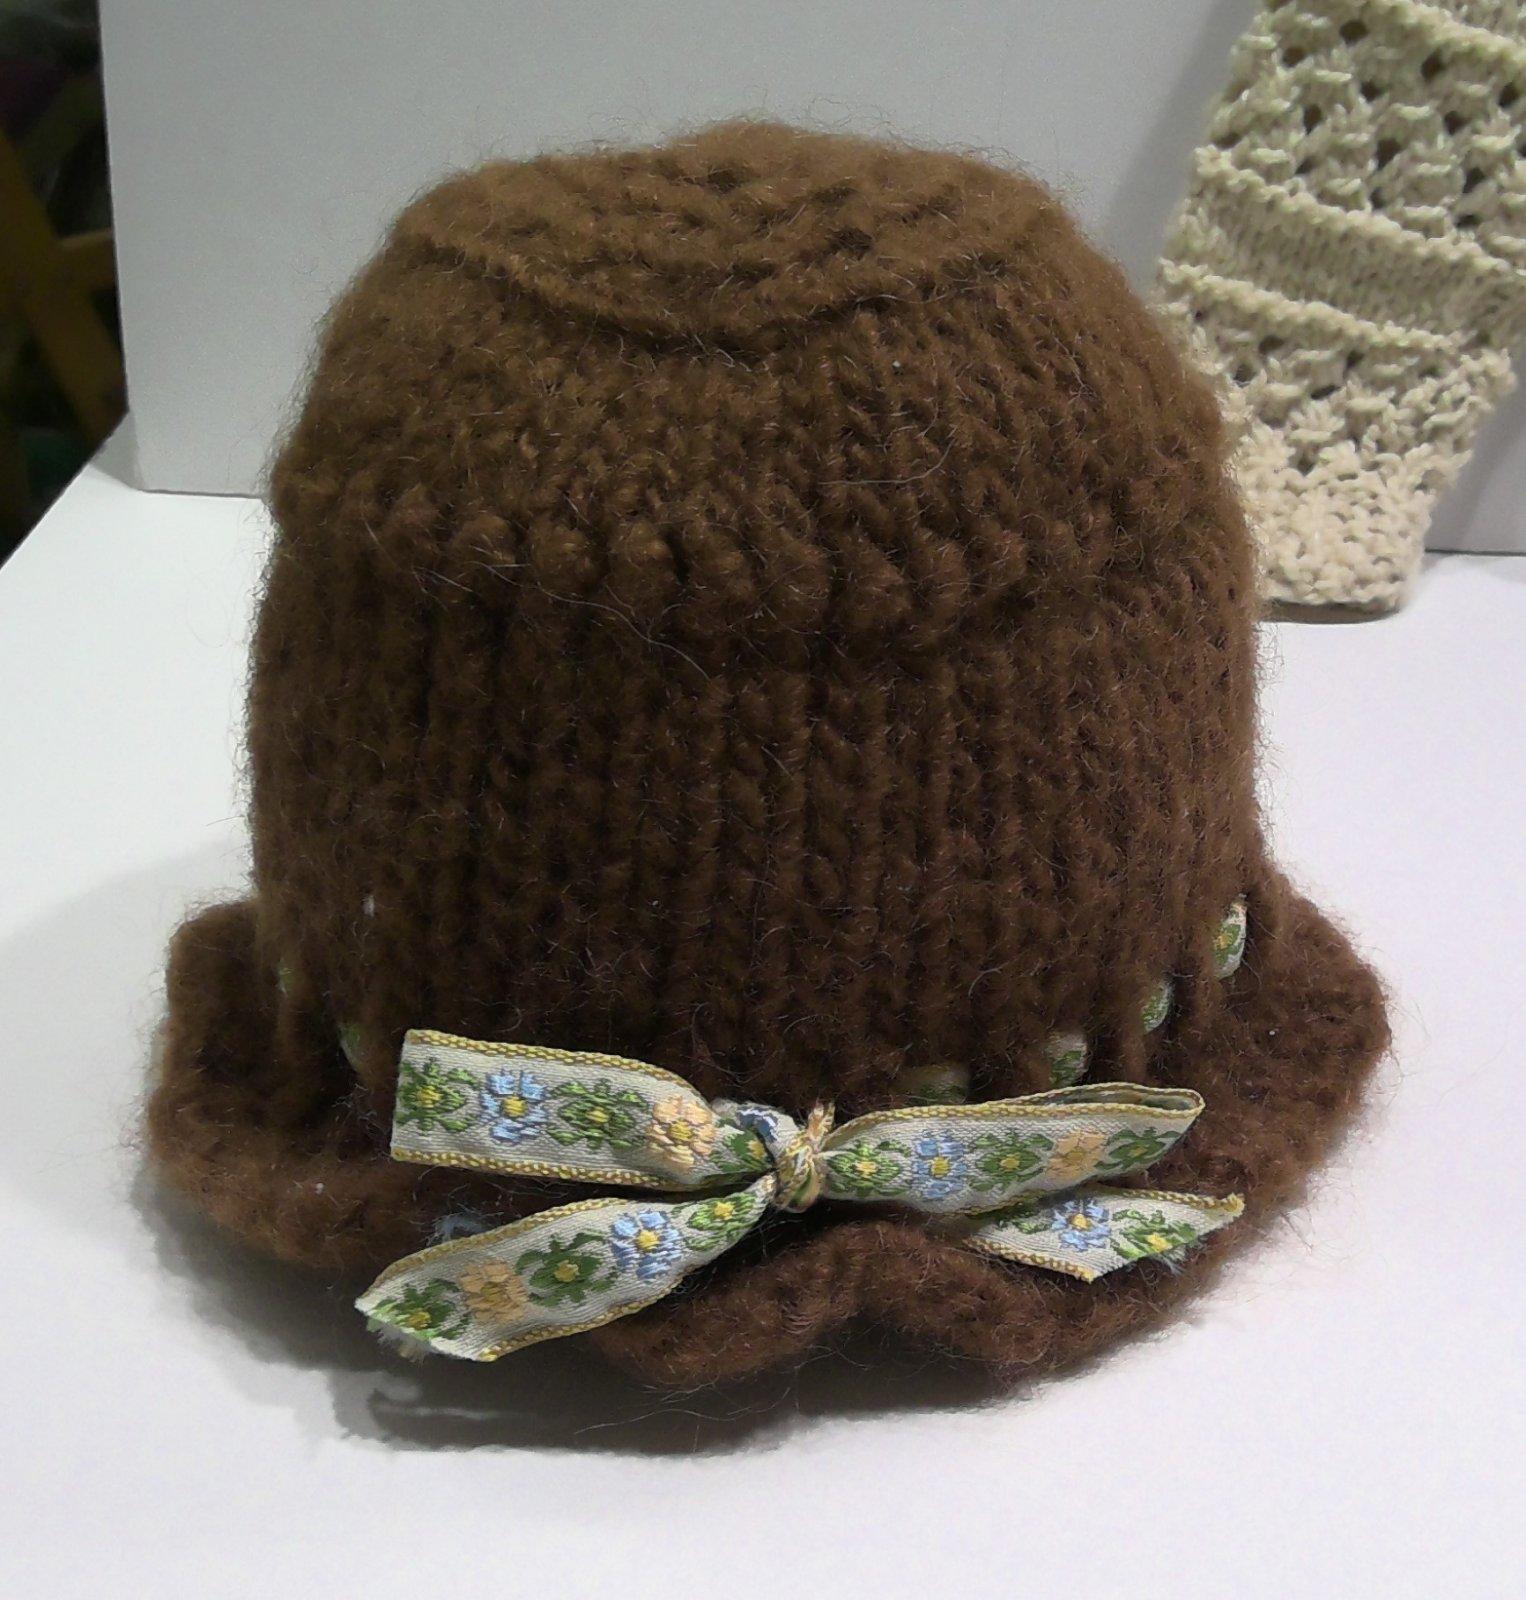 Baby Hat - Brown - Handmade